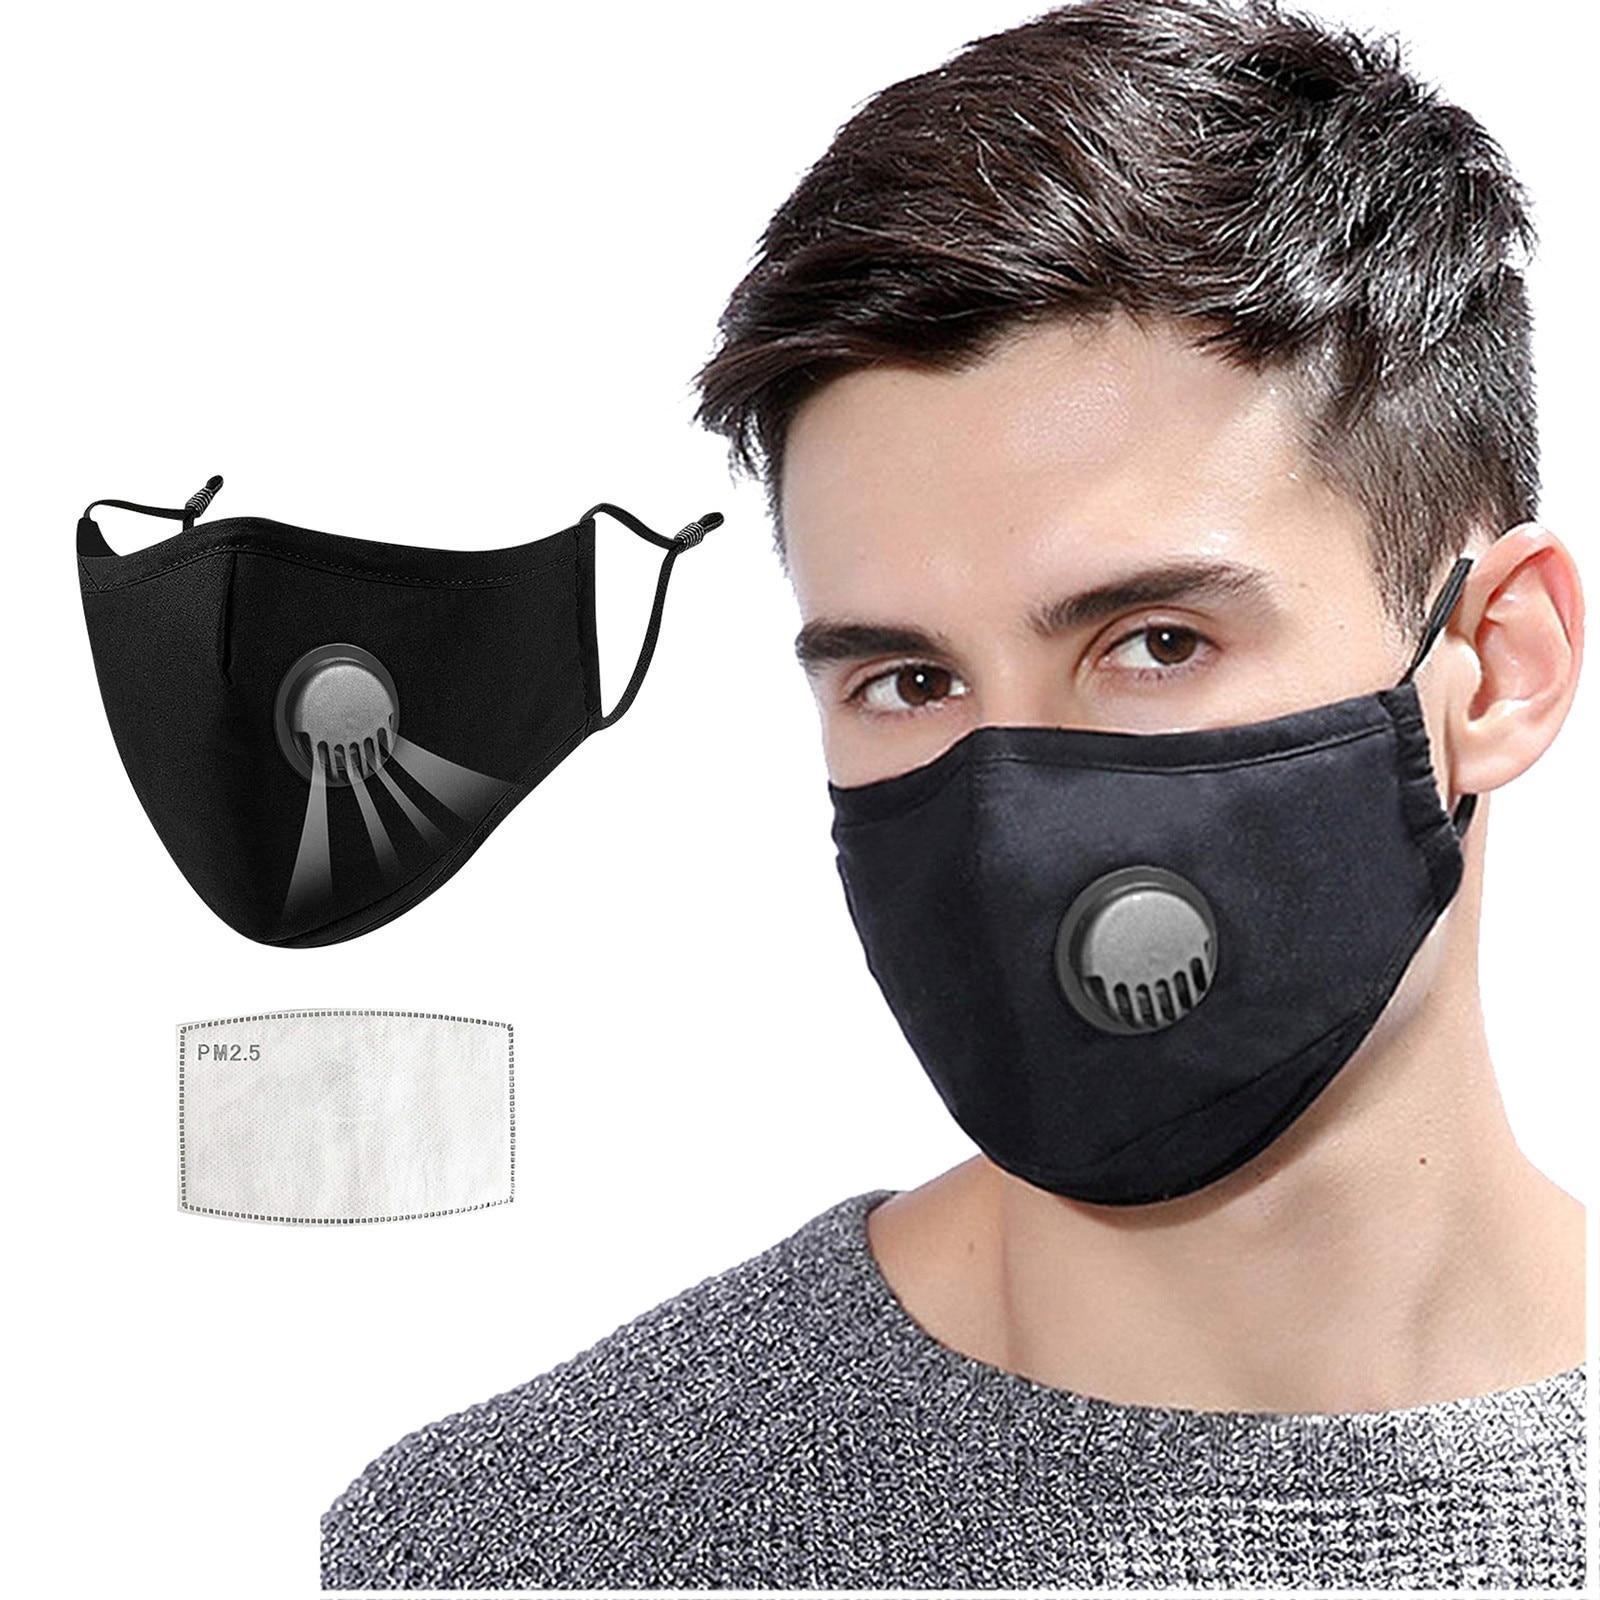 Máscara de boca preta reusável unisex máscara protetora ao ar livre mascarillas masque mondmasker válvulas respiratórias máscara de boca com filtro